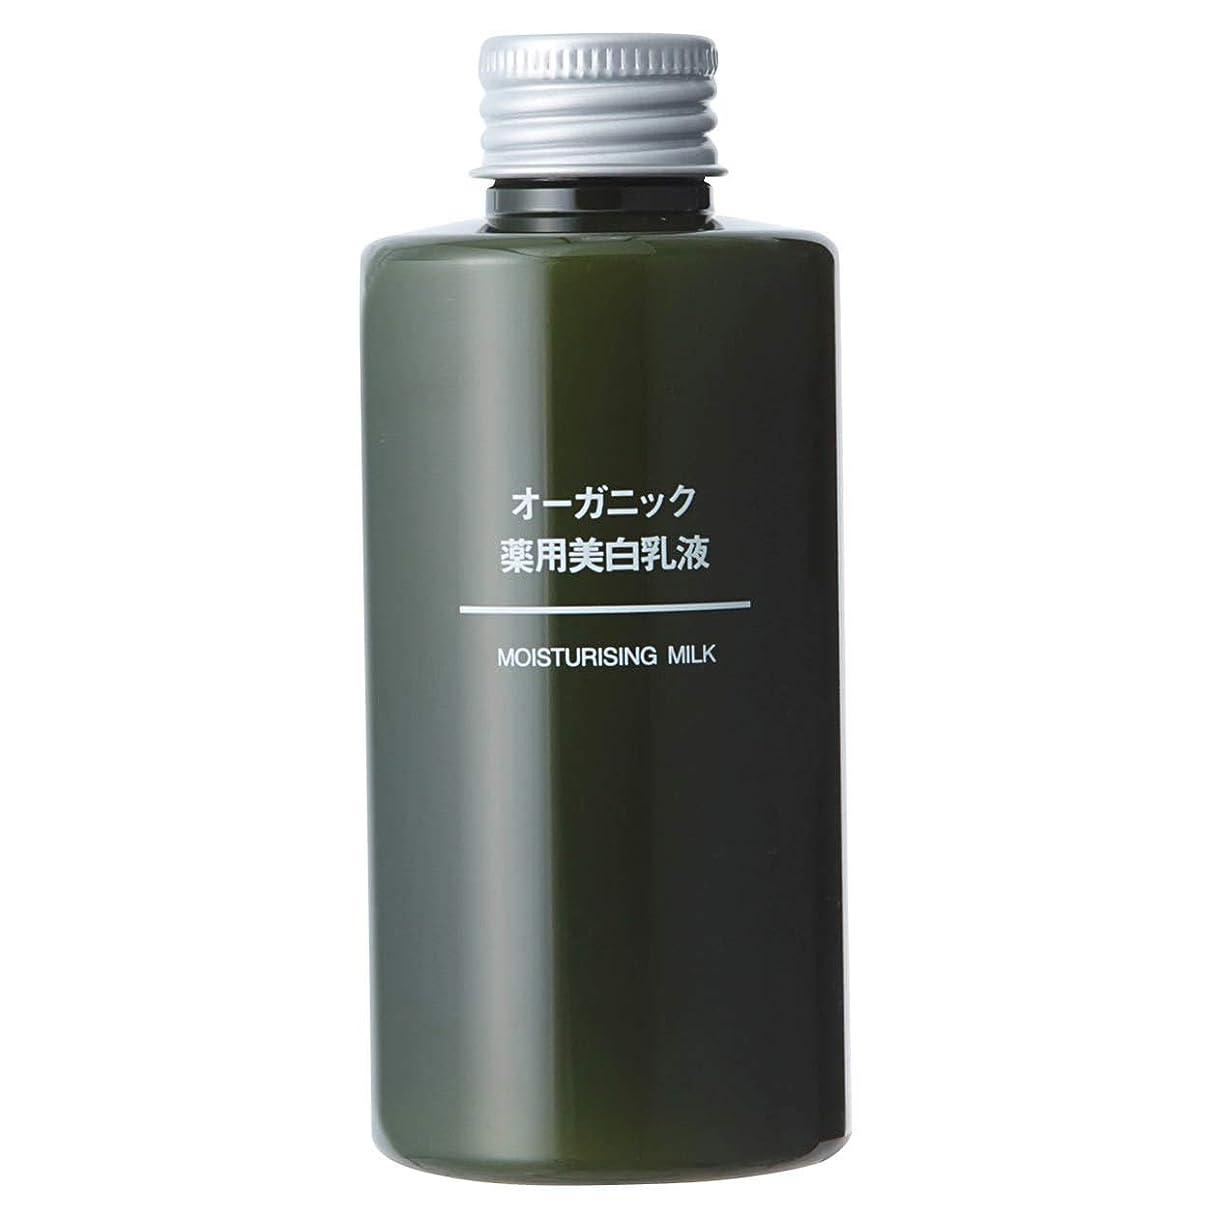 武装解除バリー防衛無印良品 オーガニック薬用美白乳液 (新)150ml